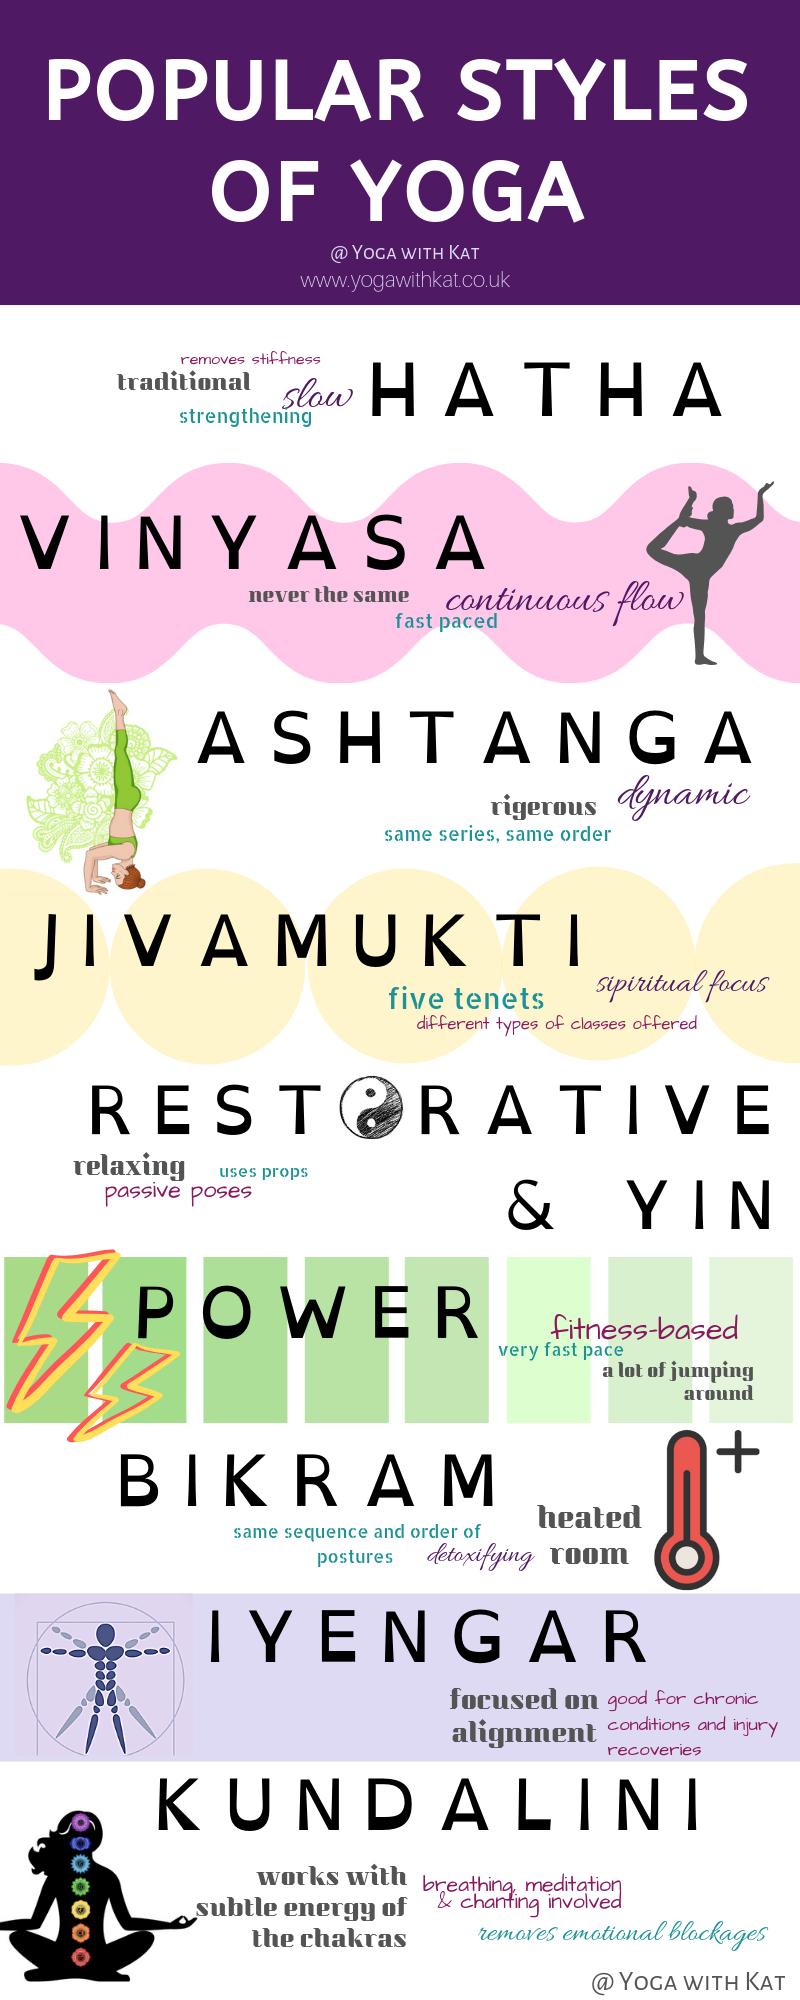 popular styles of yoga infographic, yoga styles cheatsheet, yoga with kat